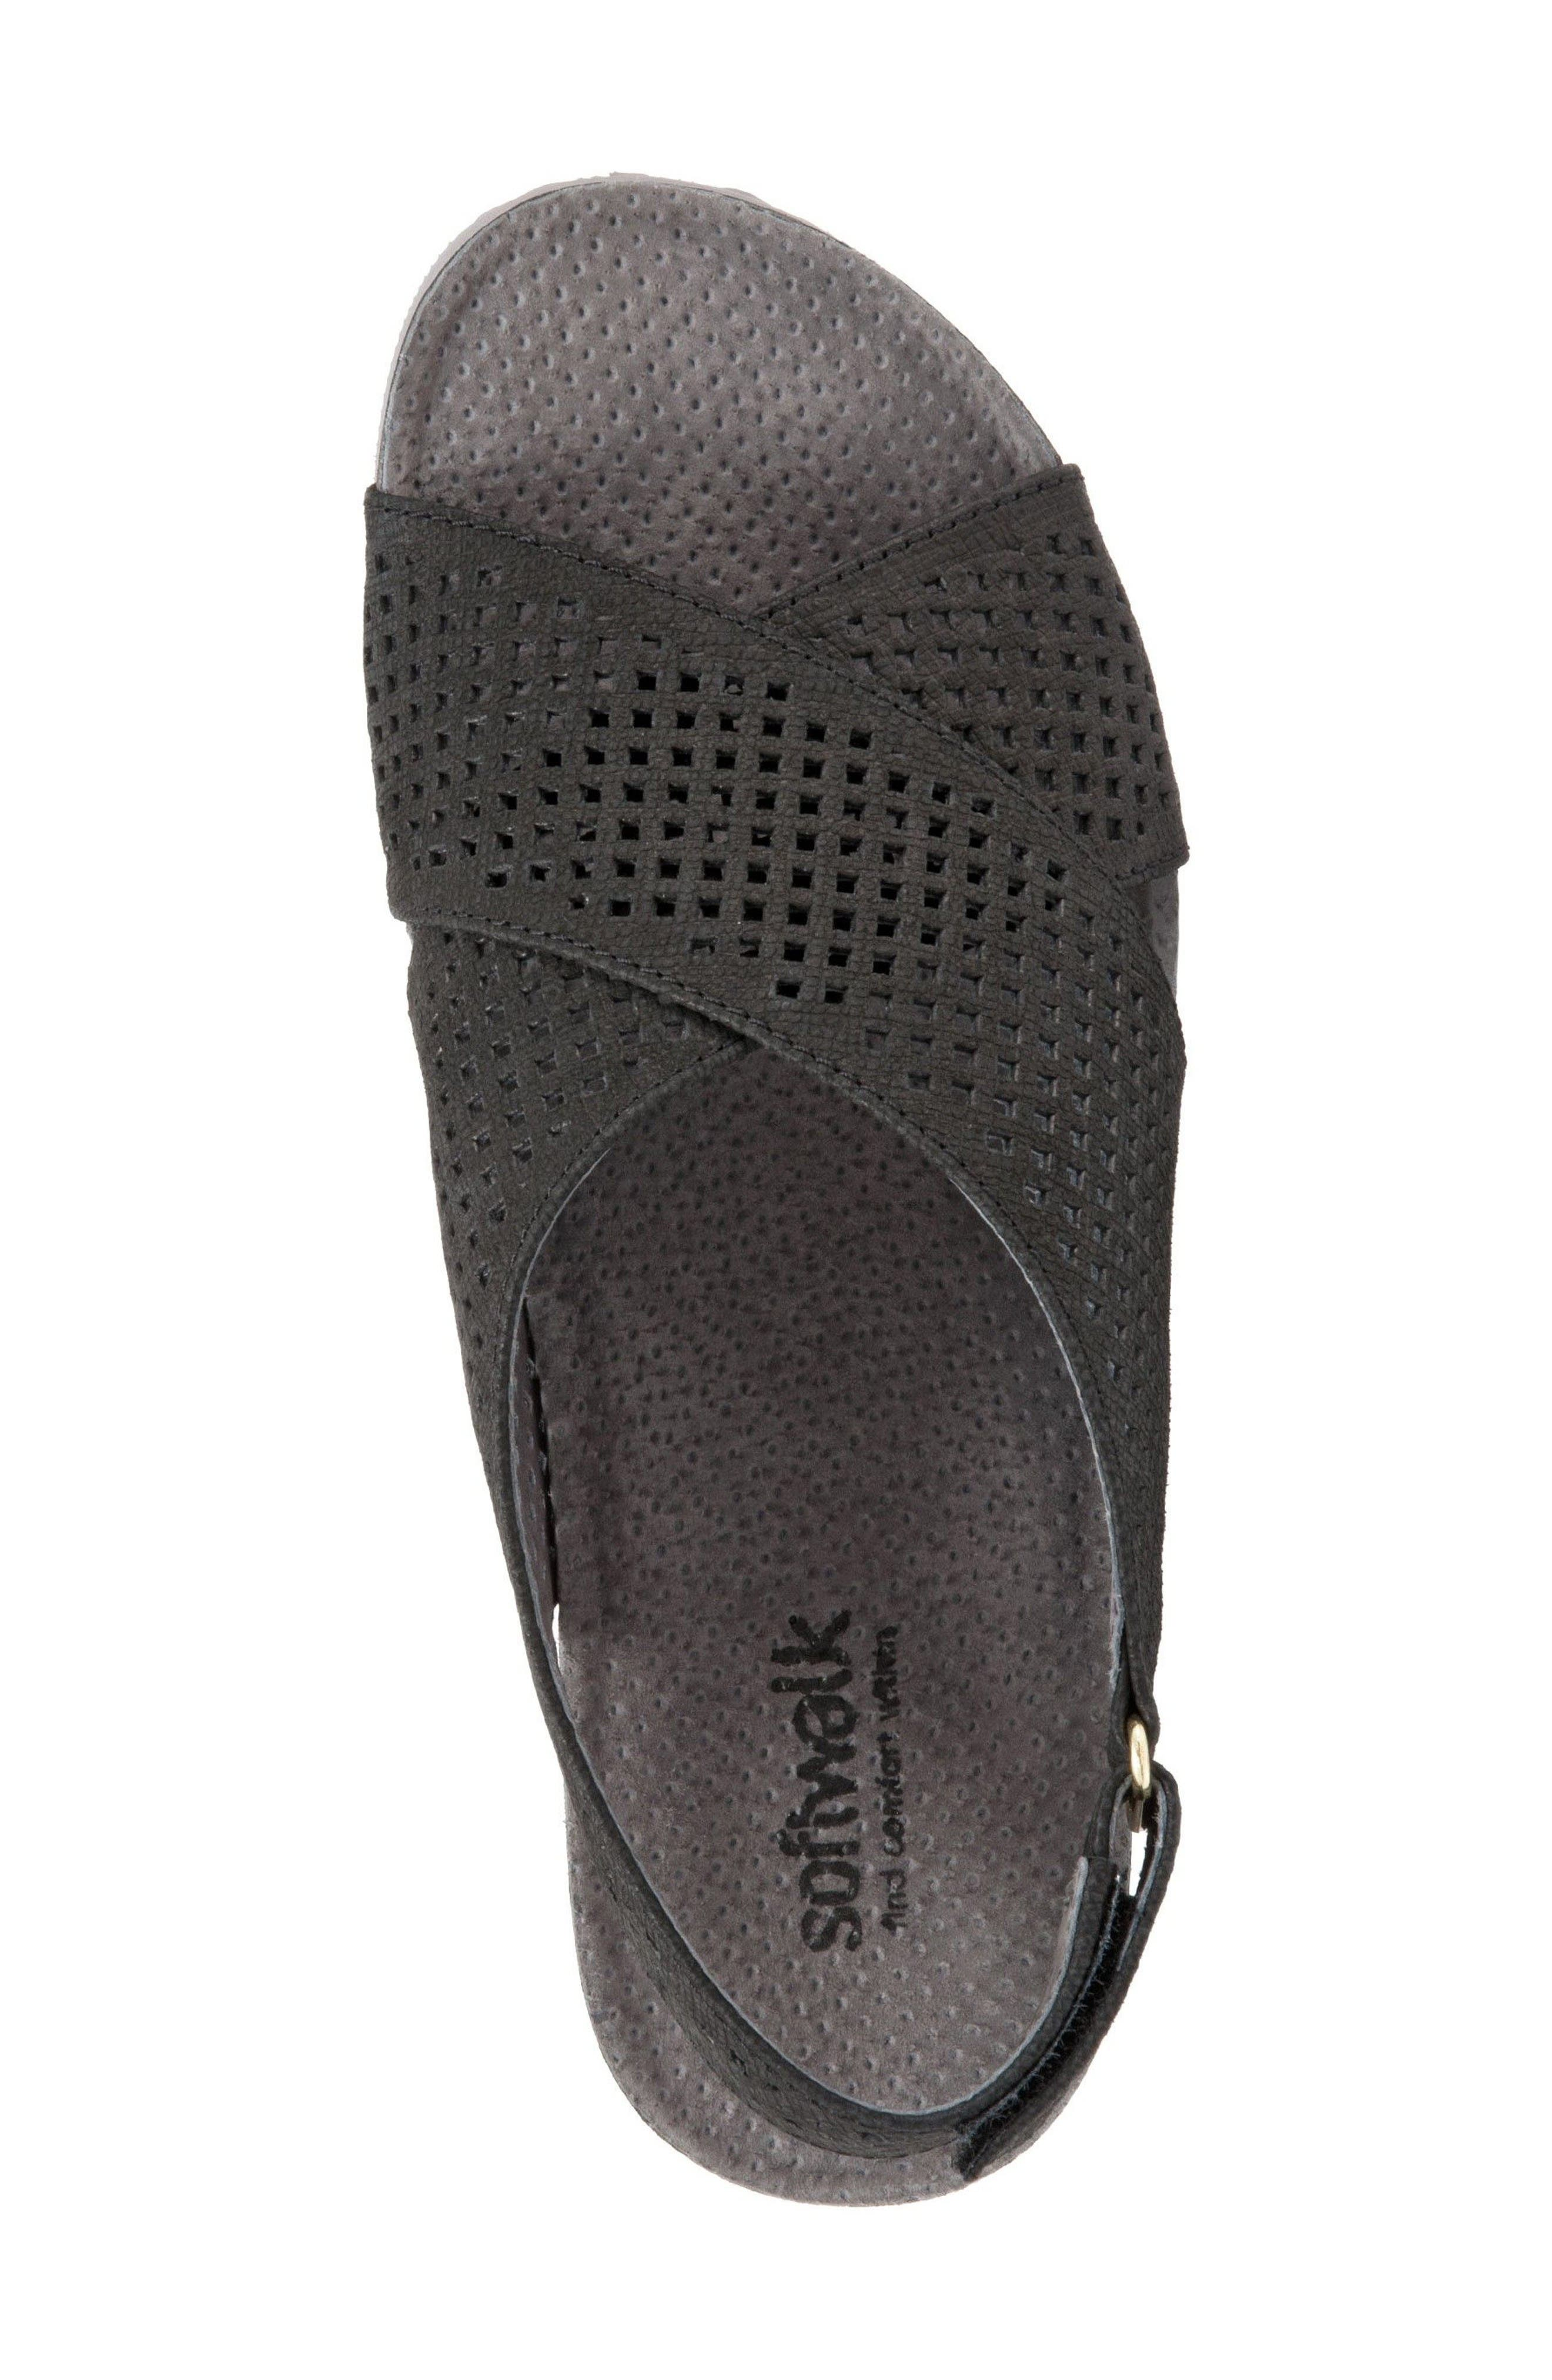 Hansford Wedge Sandal,                             Alternate thumbnail 3, color,                             Black Nubuck Leather